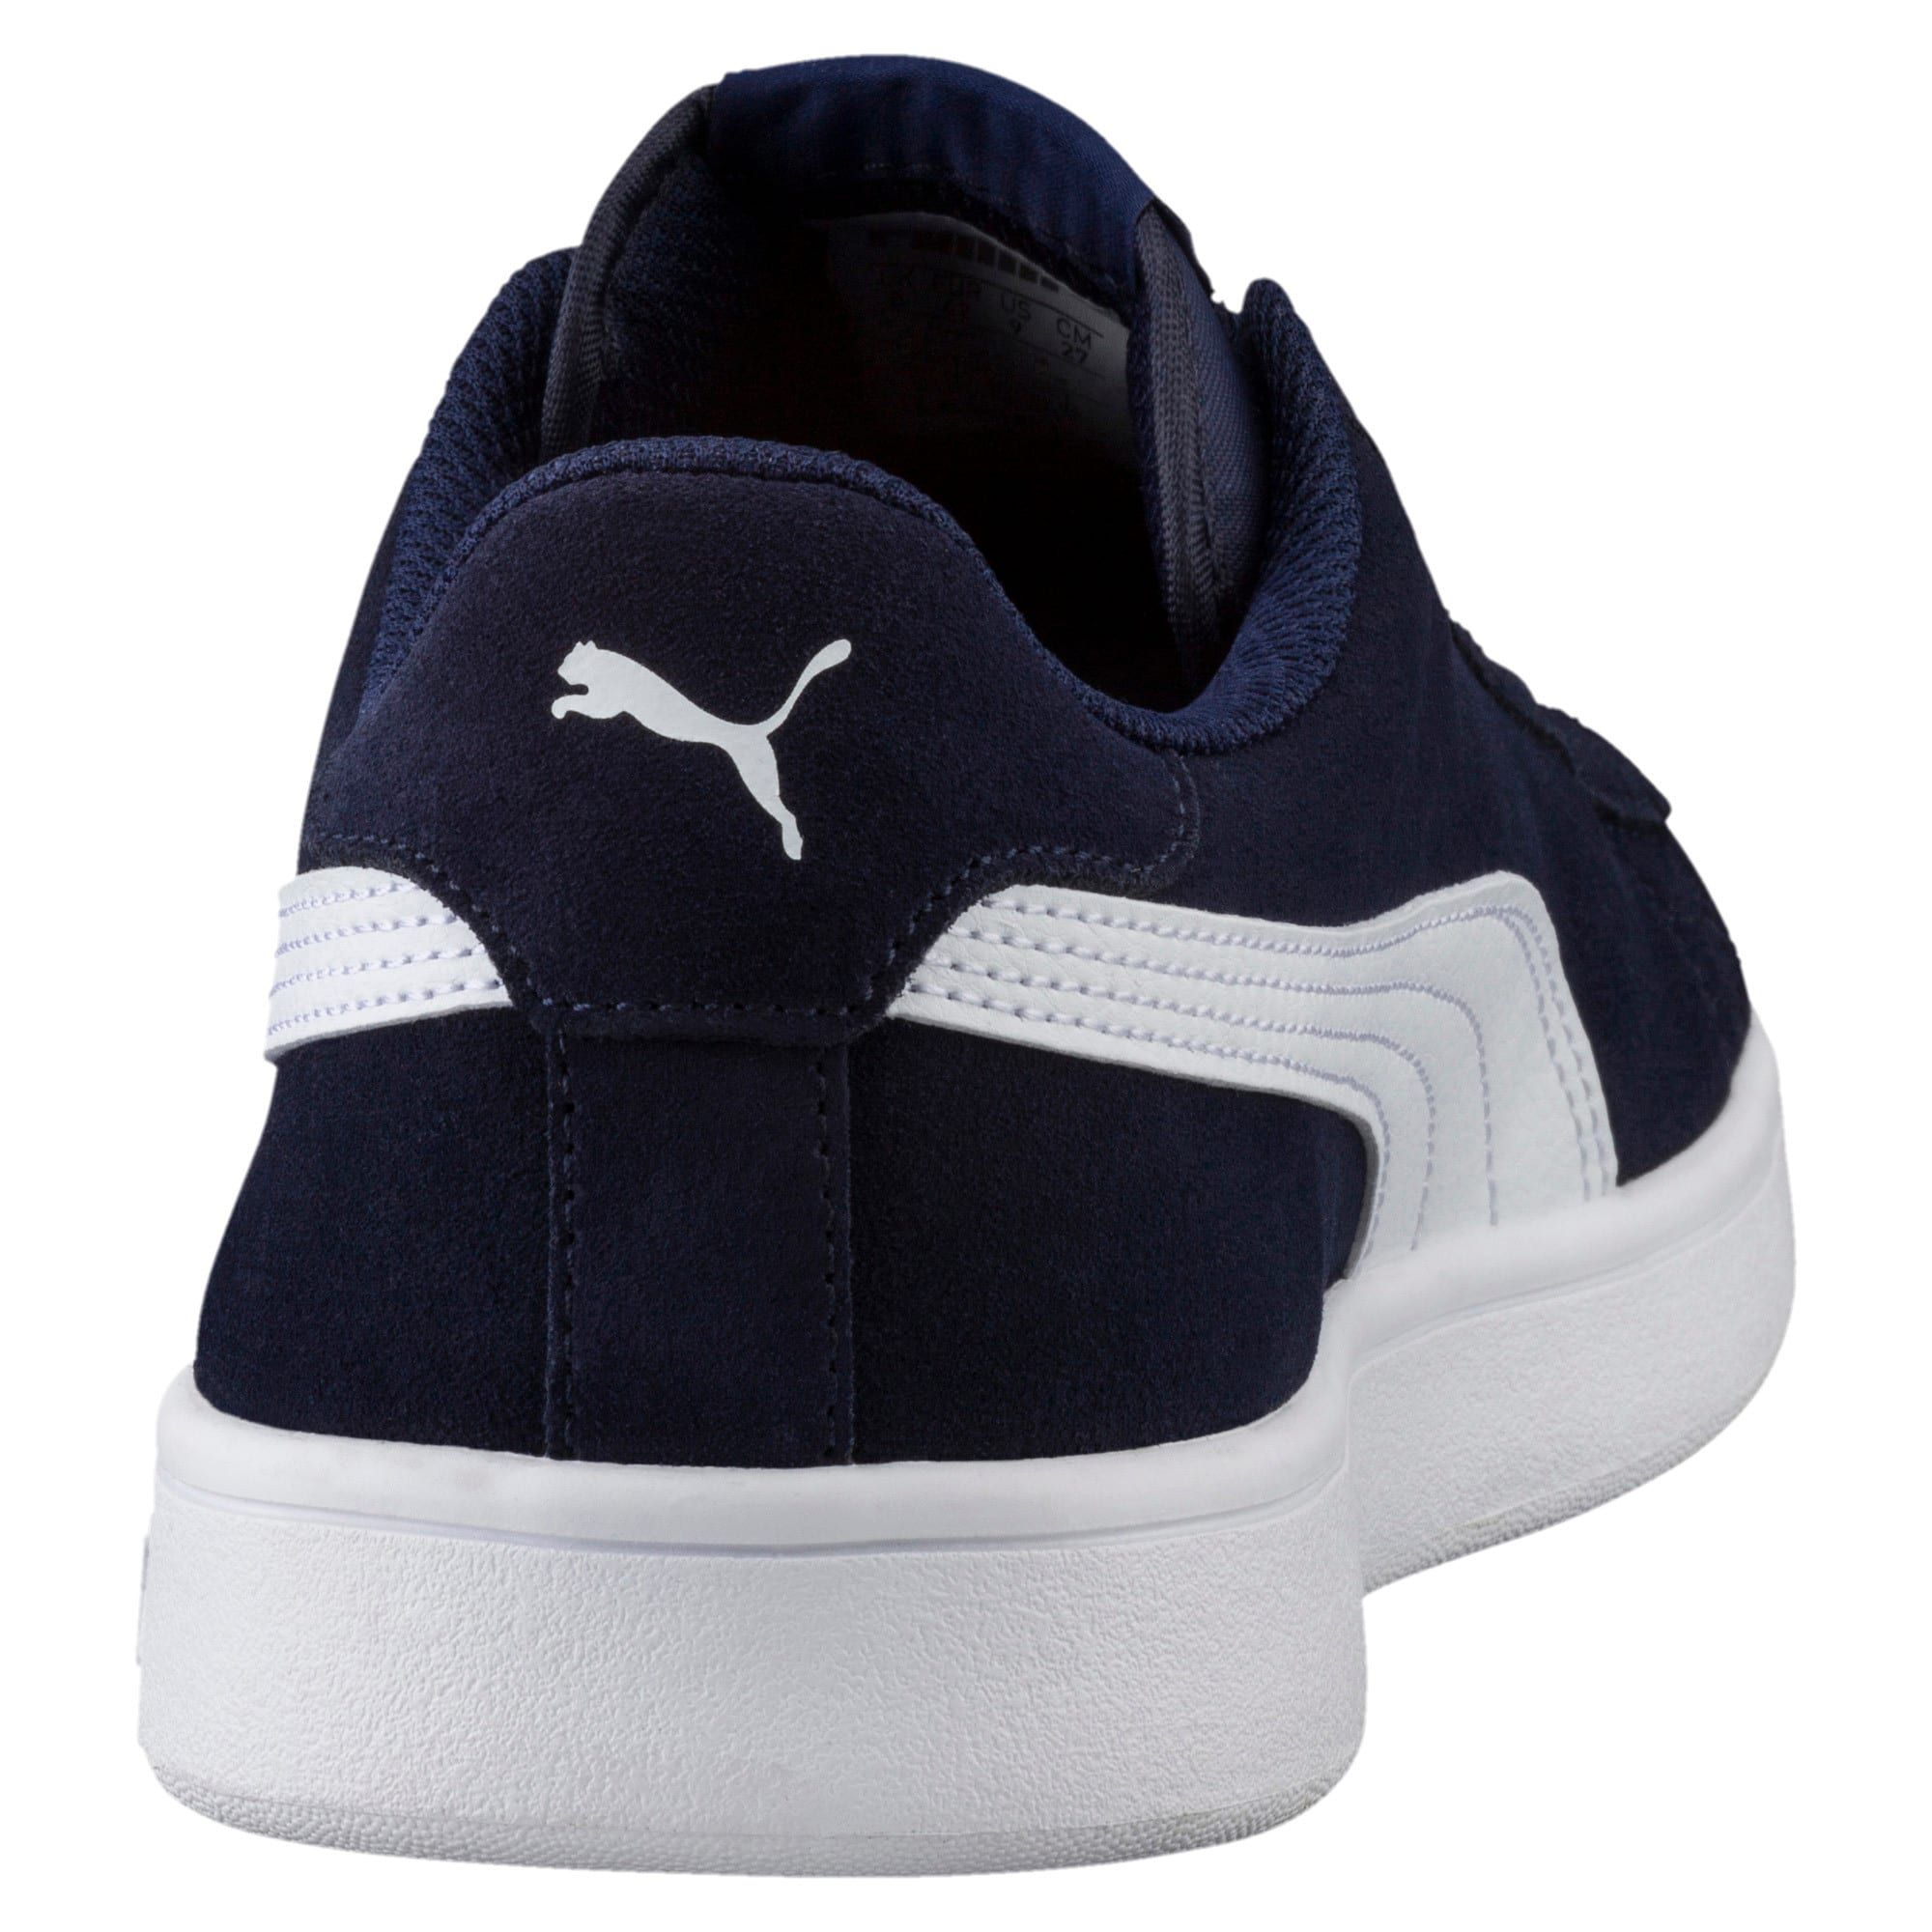 PUMA Chaussure Basket Smash v2, BleuBlanc, Taille 37.5